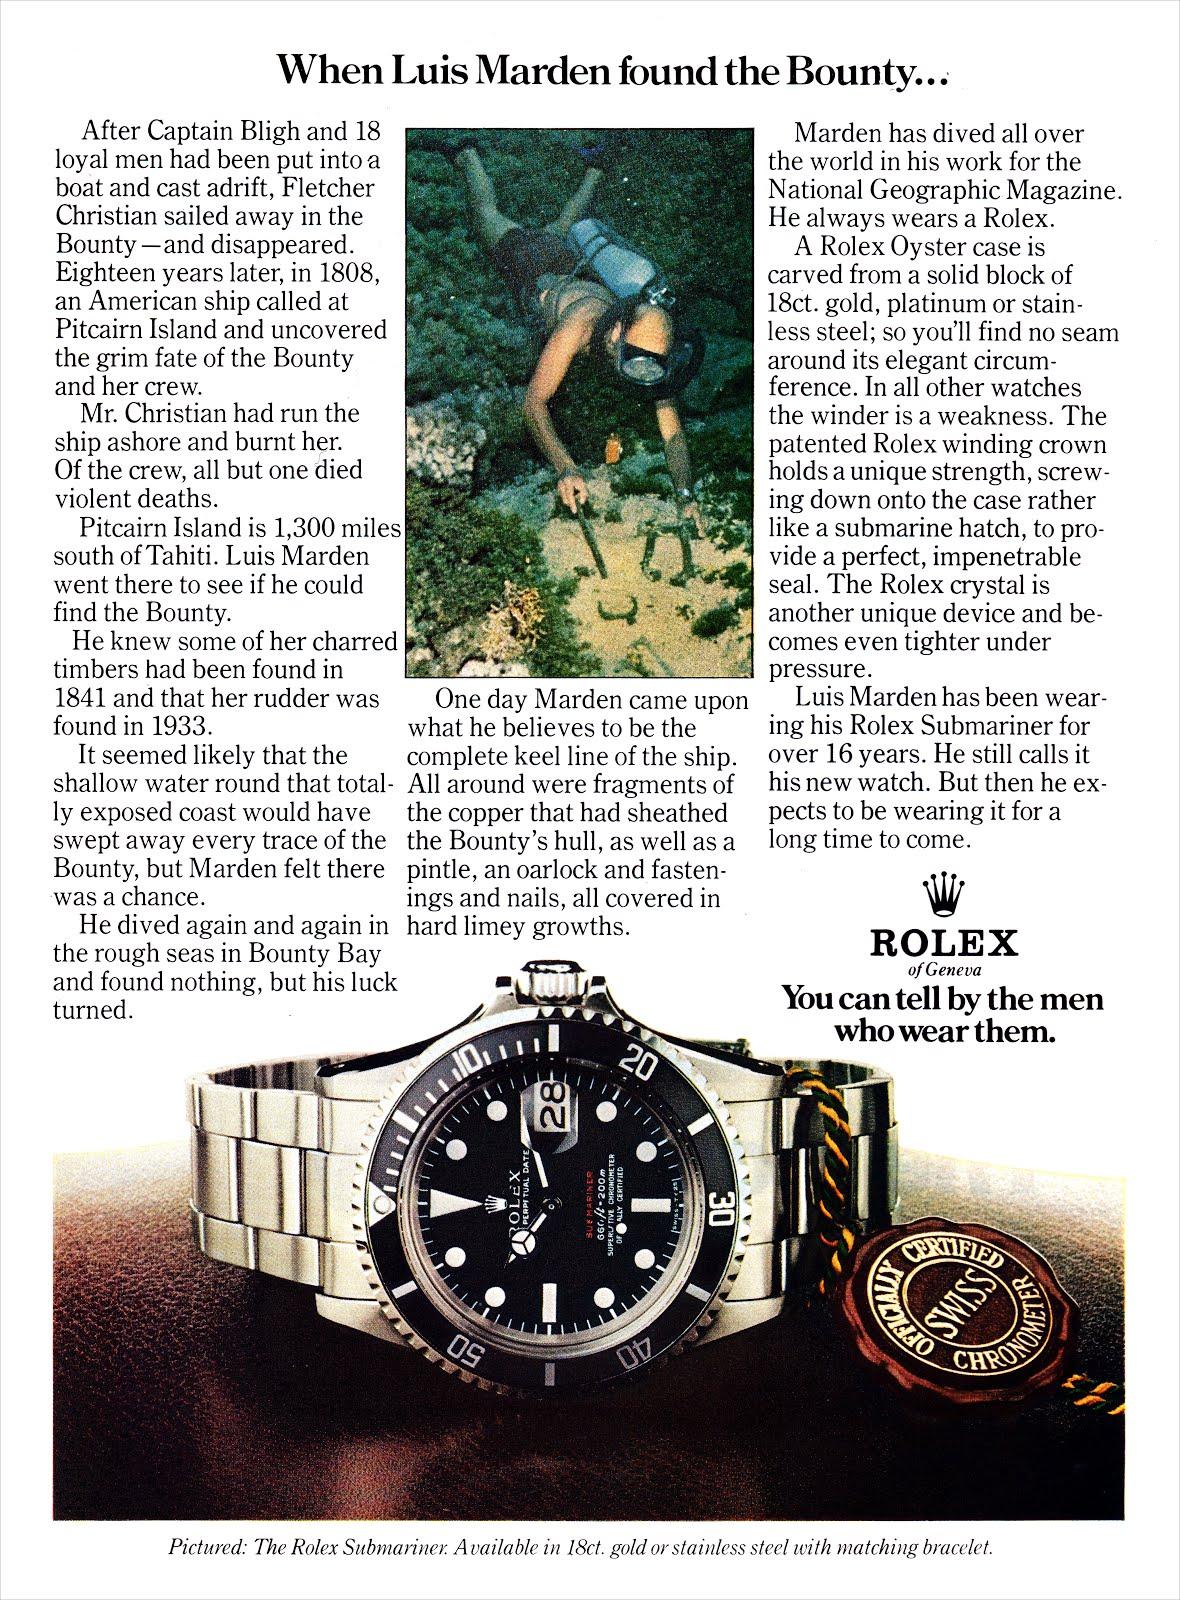 http://2.bp.blogspot.com/-XYBauj-DCSI/UPIMIPmFPQI/AAAAAAAAUos/xrDmR-QWgqE/s1600/Luis-Marden-Rolex-Submariner-Ad-1976.jpg